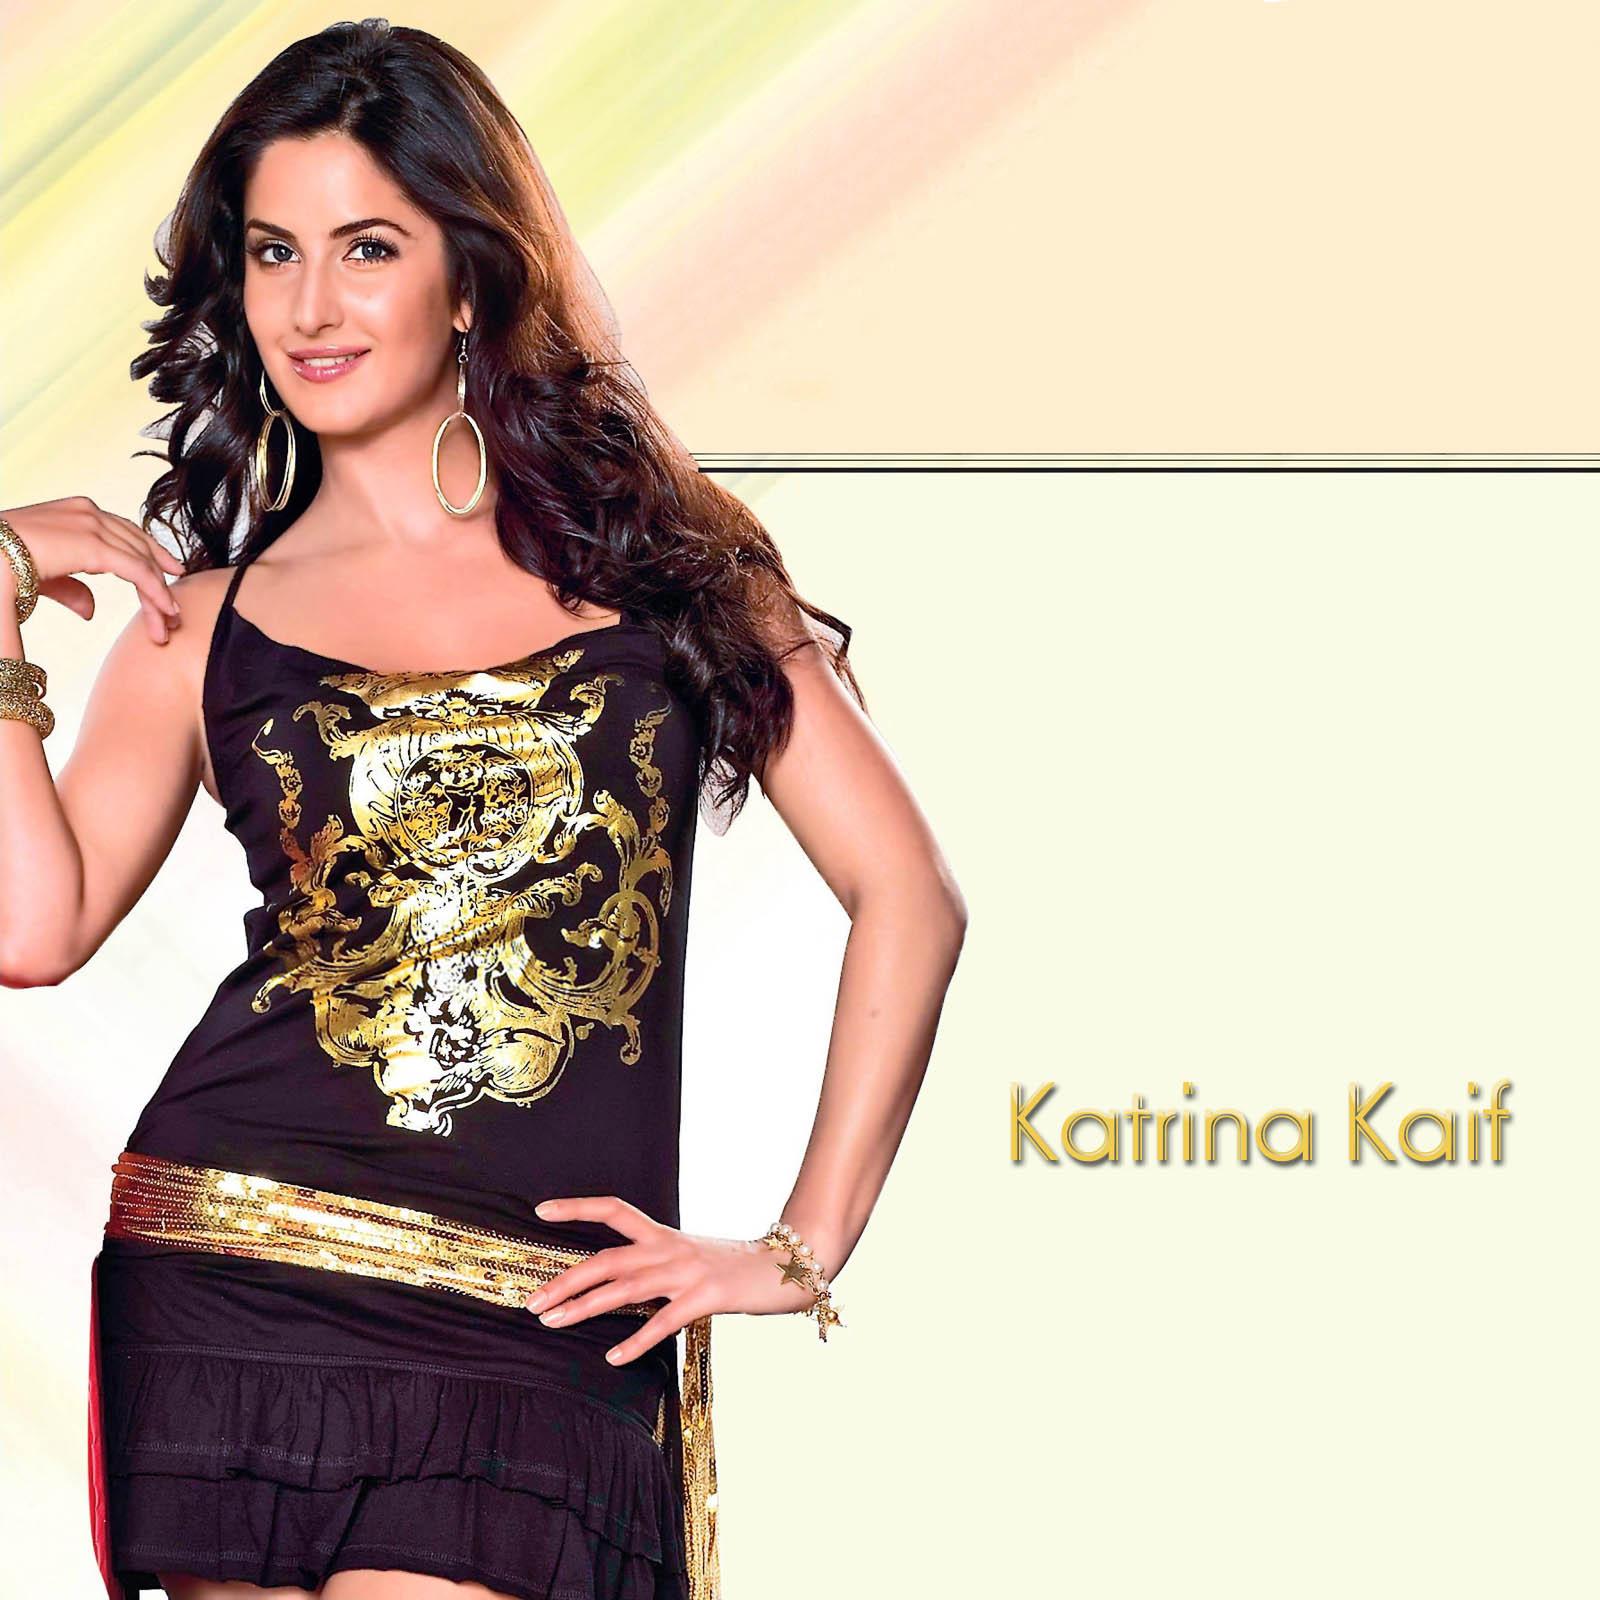 Fashion Amp Style Katrina Kaif New And Latest HD HQ